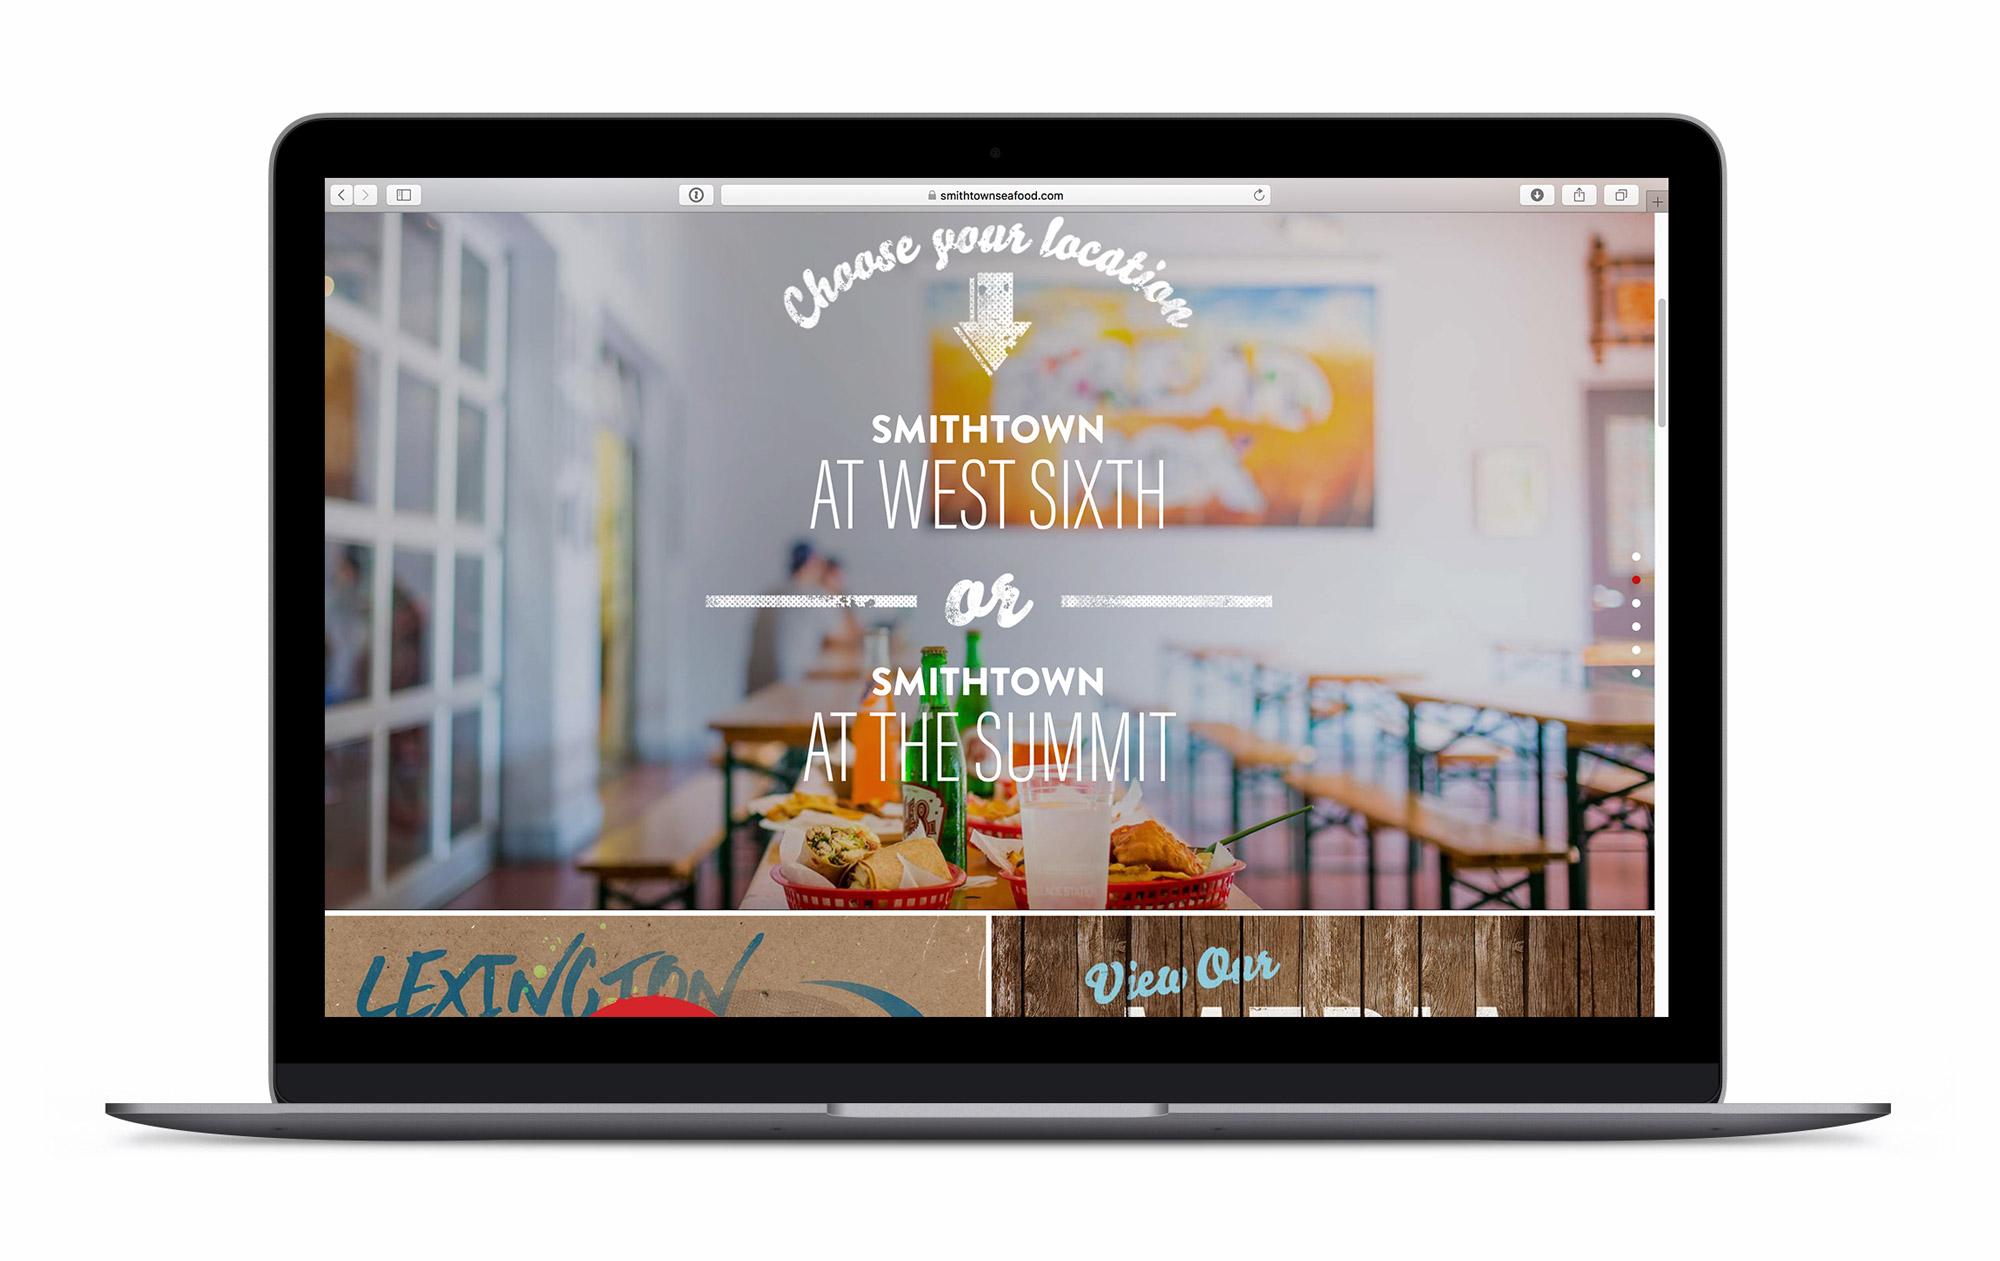 macbook-smithtown-1-web.jpg